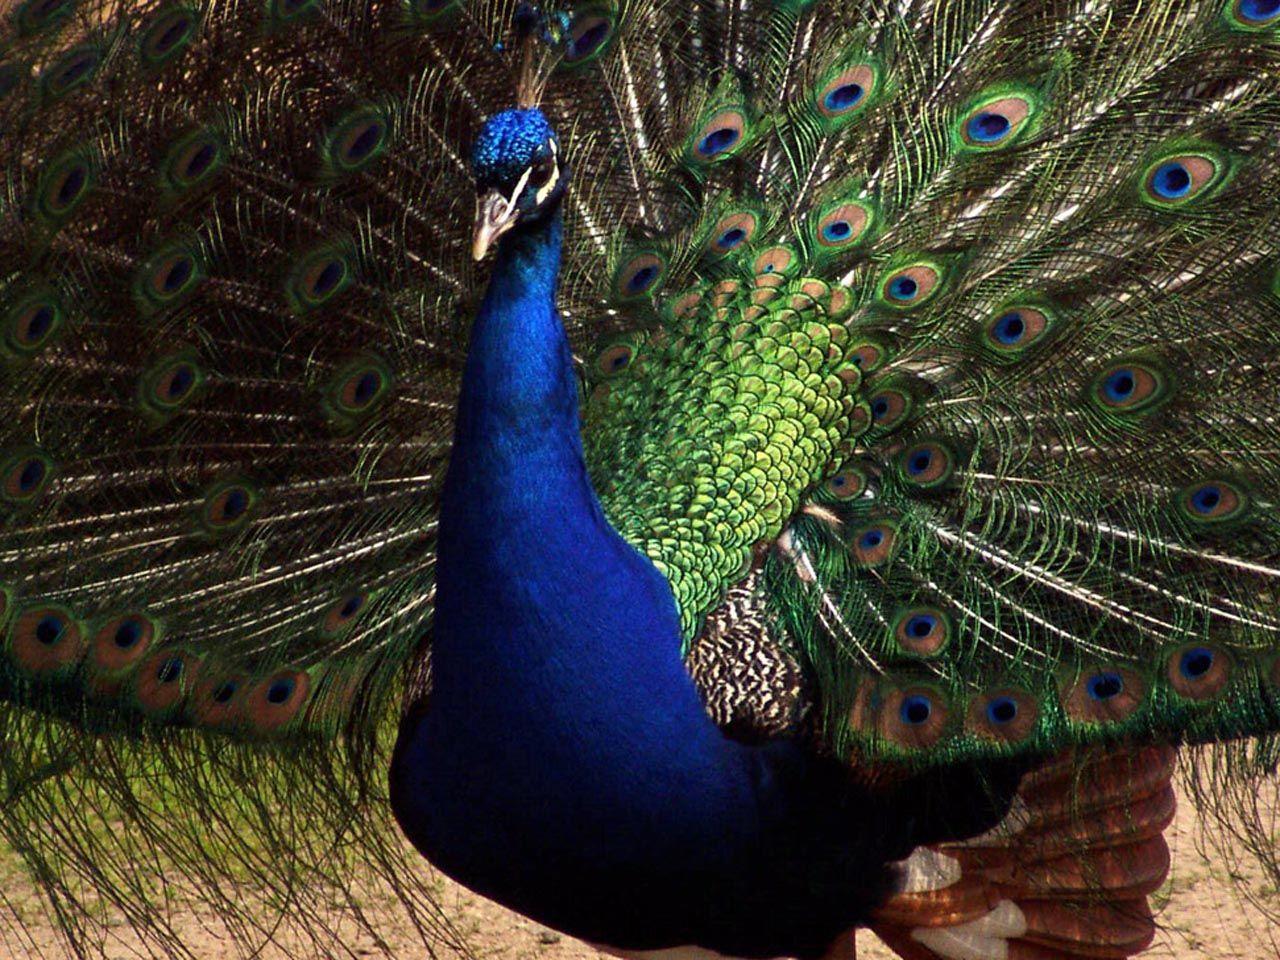 Peacock blue wallpaper  Funny Animal - photo#1